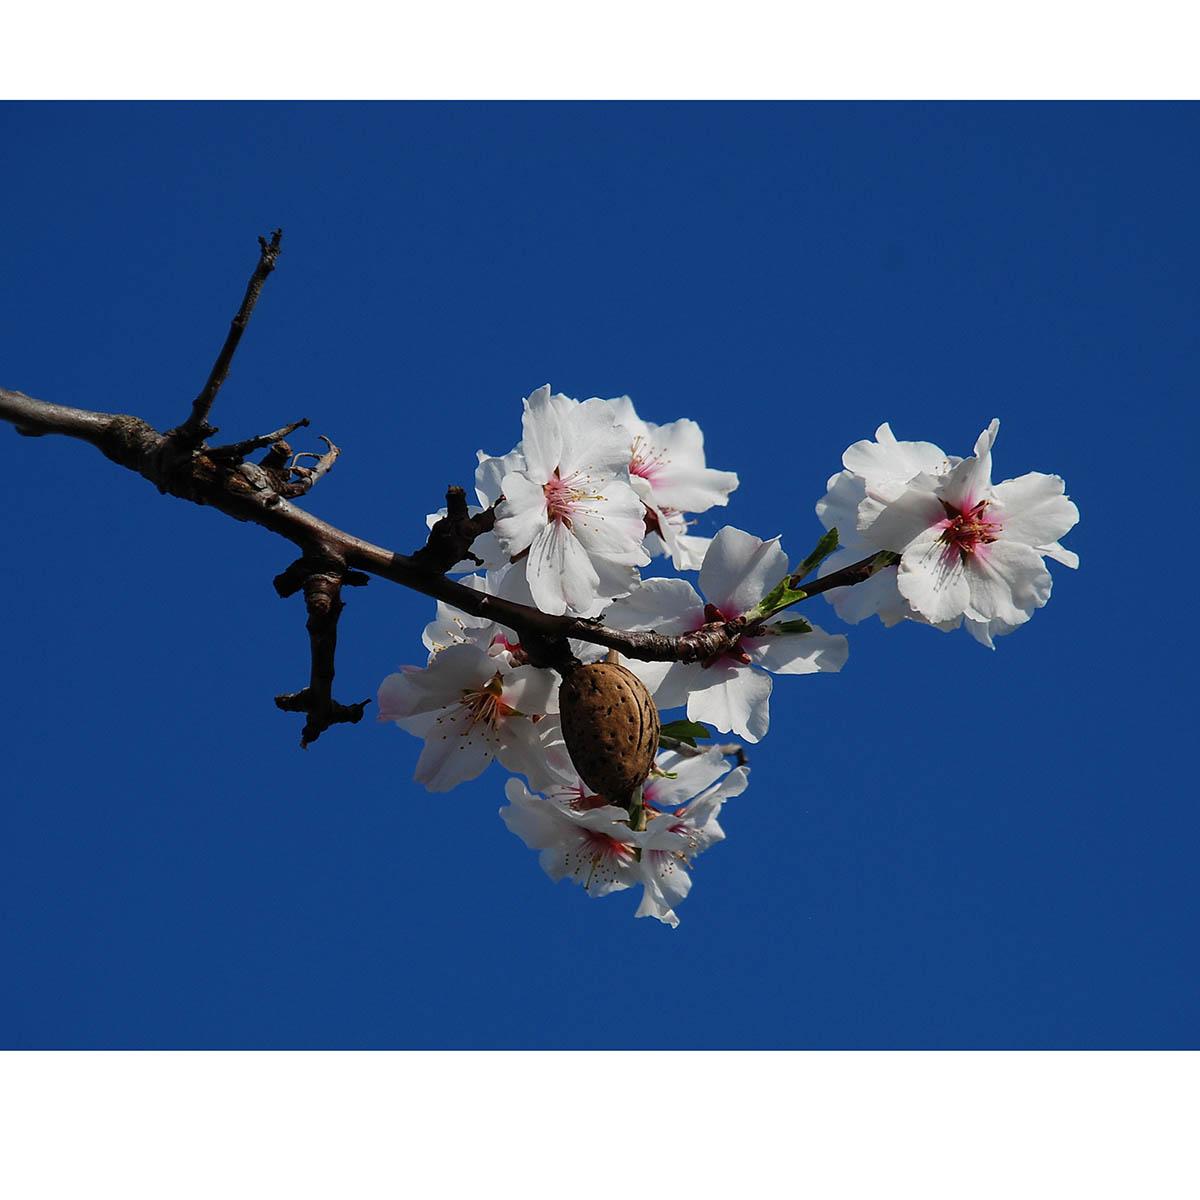 Kurt Keller: Mandelblüte in Gimmeldingen, 2020, Digitalfarbfotografie